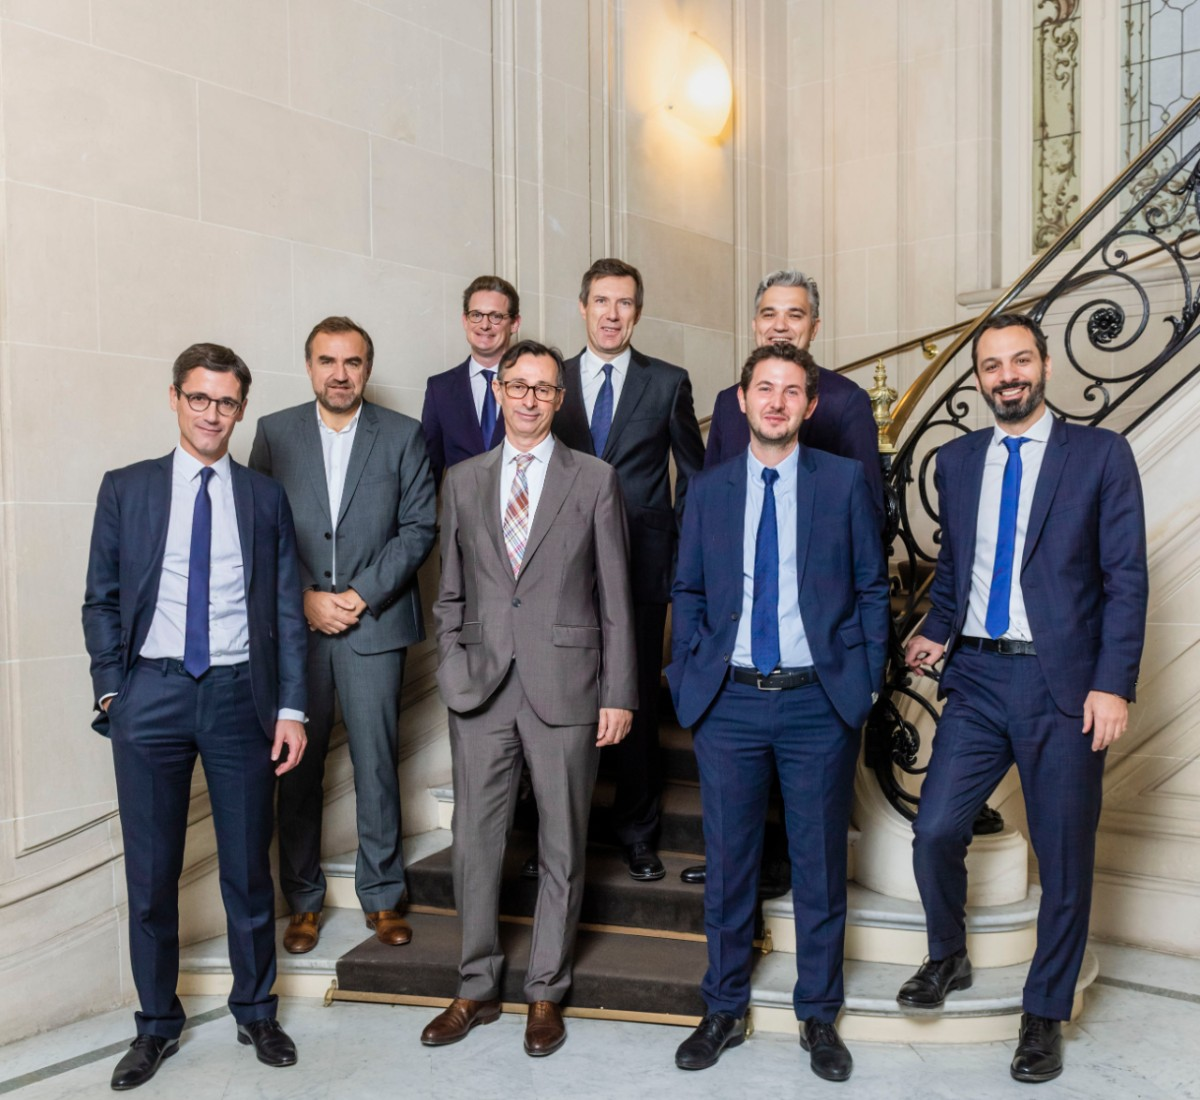 photo of panelists, including Orrick Paris Finance partner Amaury de Feydeau